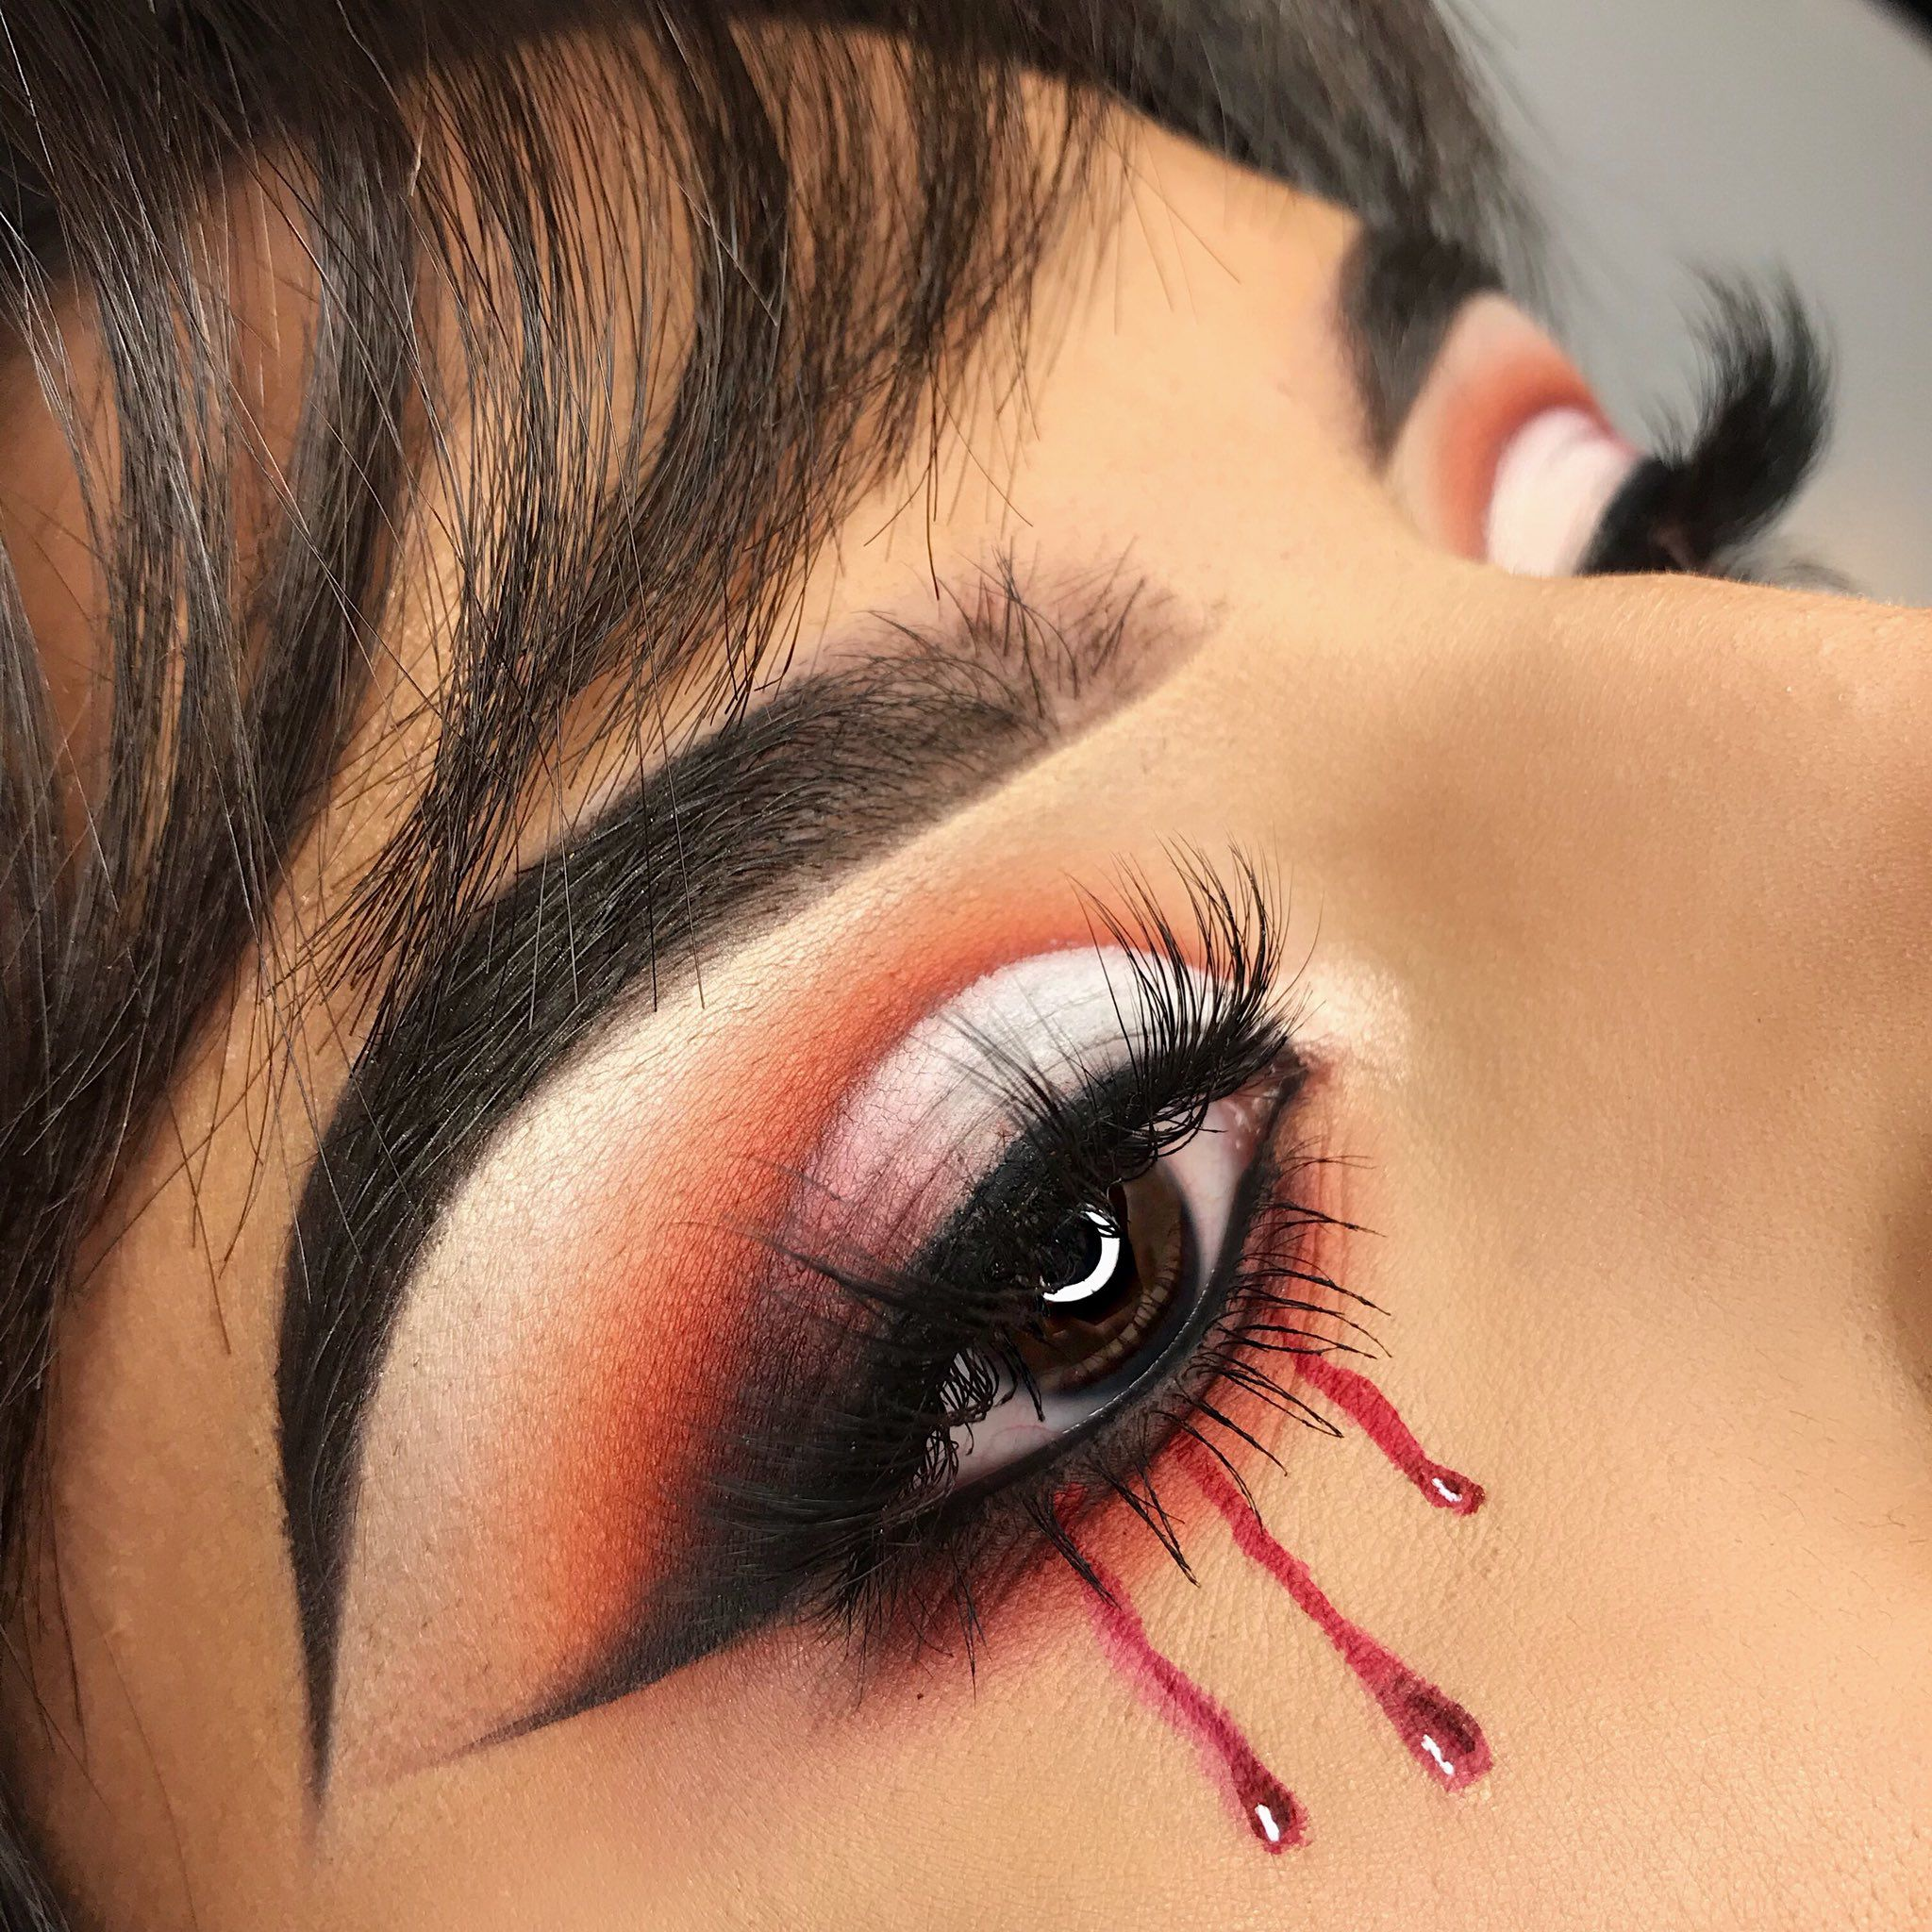 Pin by 𖤐𝔏𝔞𝔲𝔯𝔶𝔫 𝔗𝔞𝔶𝔩𝔬𝔯𖤐 on ʍακεuρ♡ | Eye makeup, Cute ...